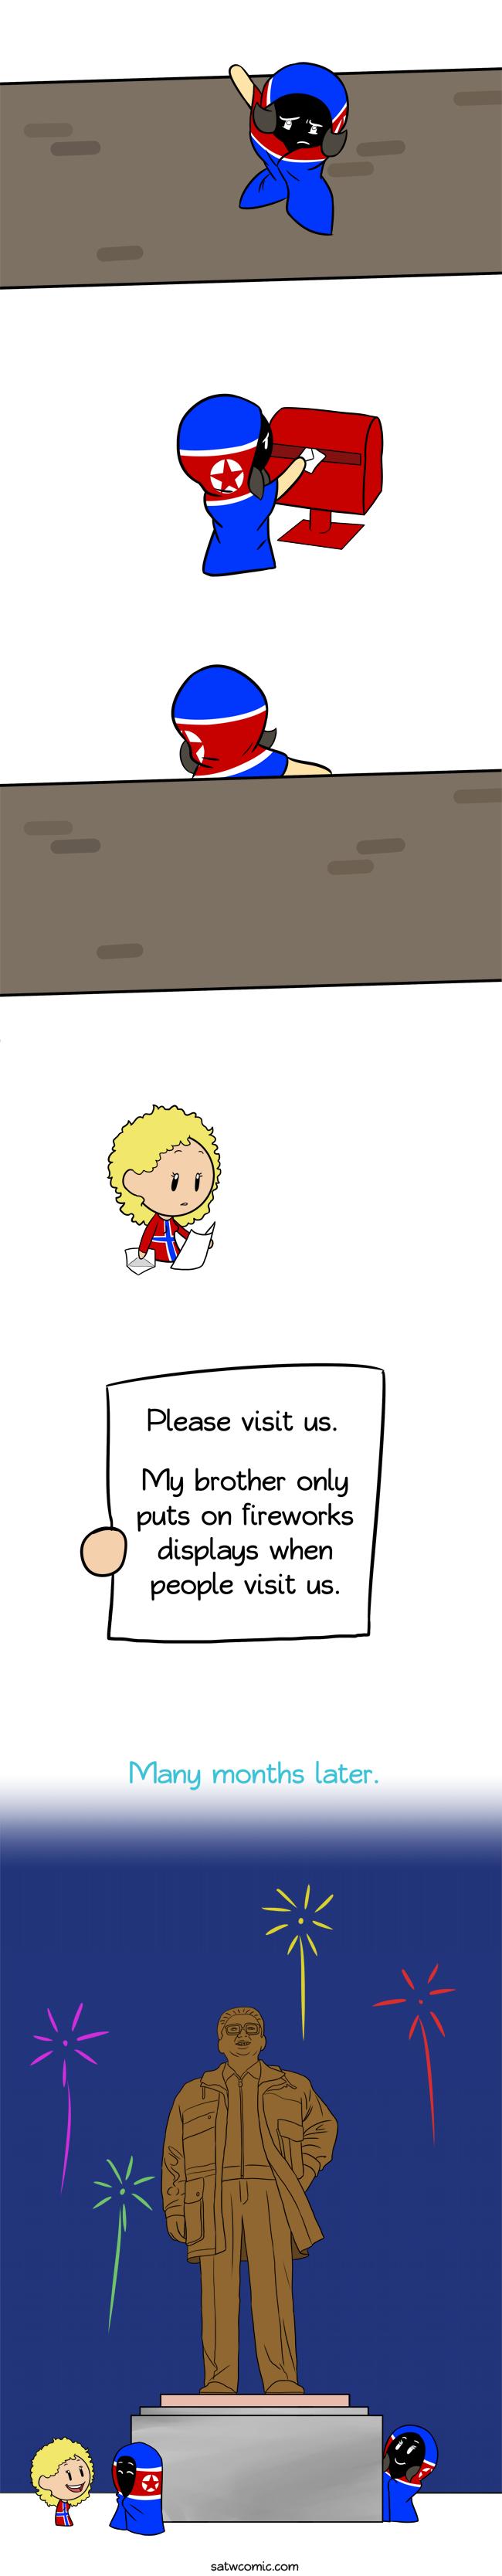 Dear Sister satwcomic.com